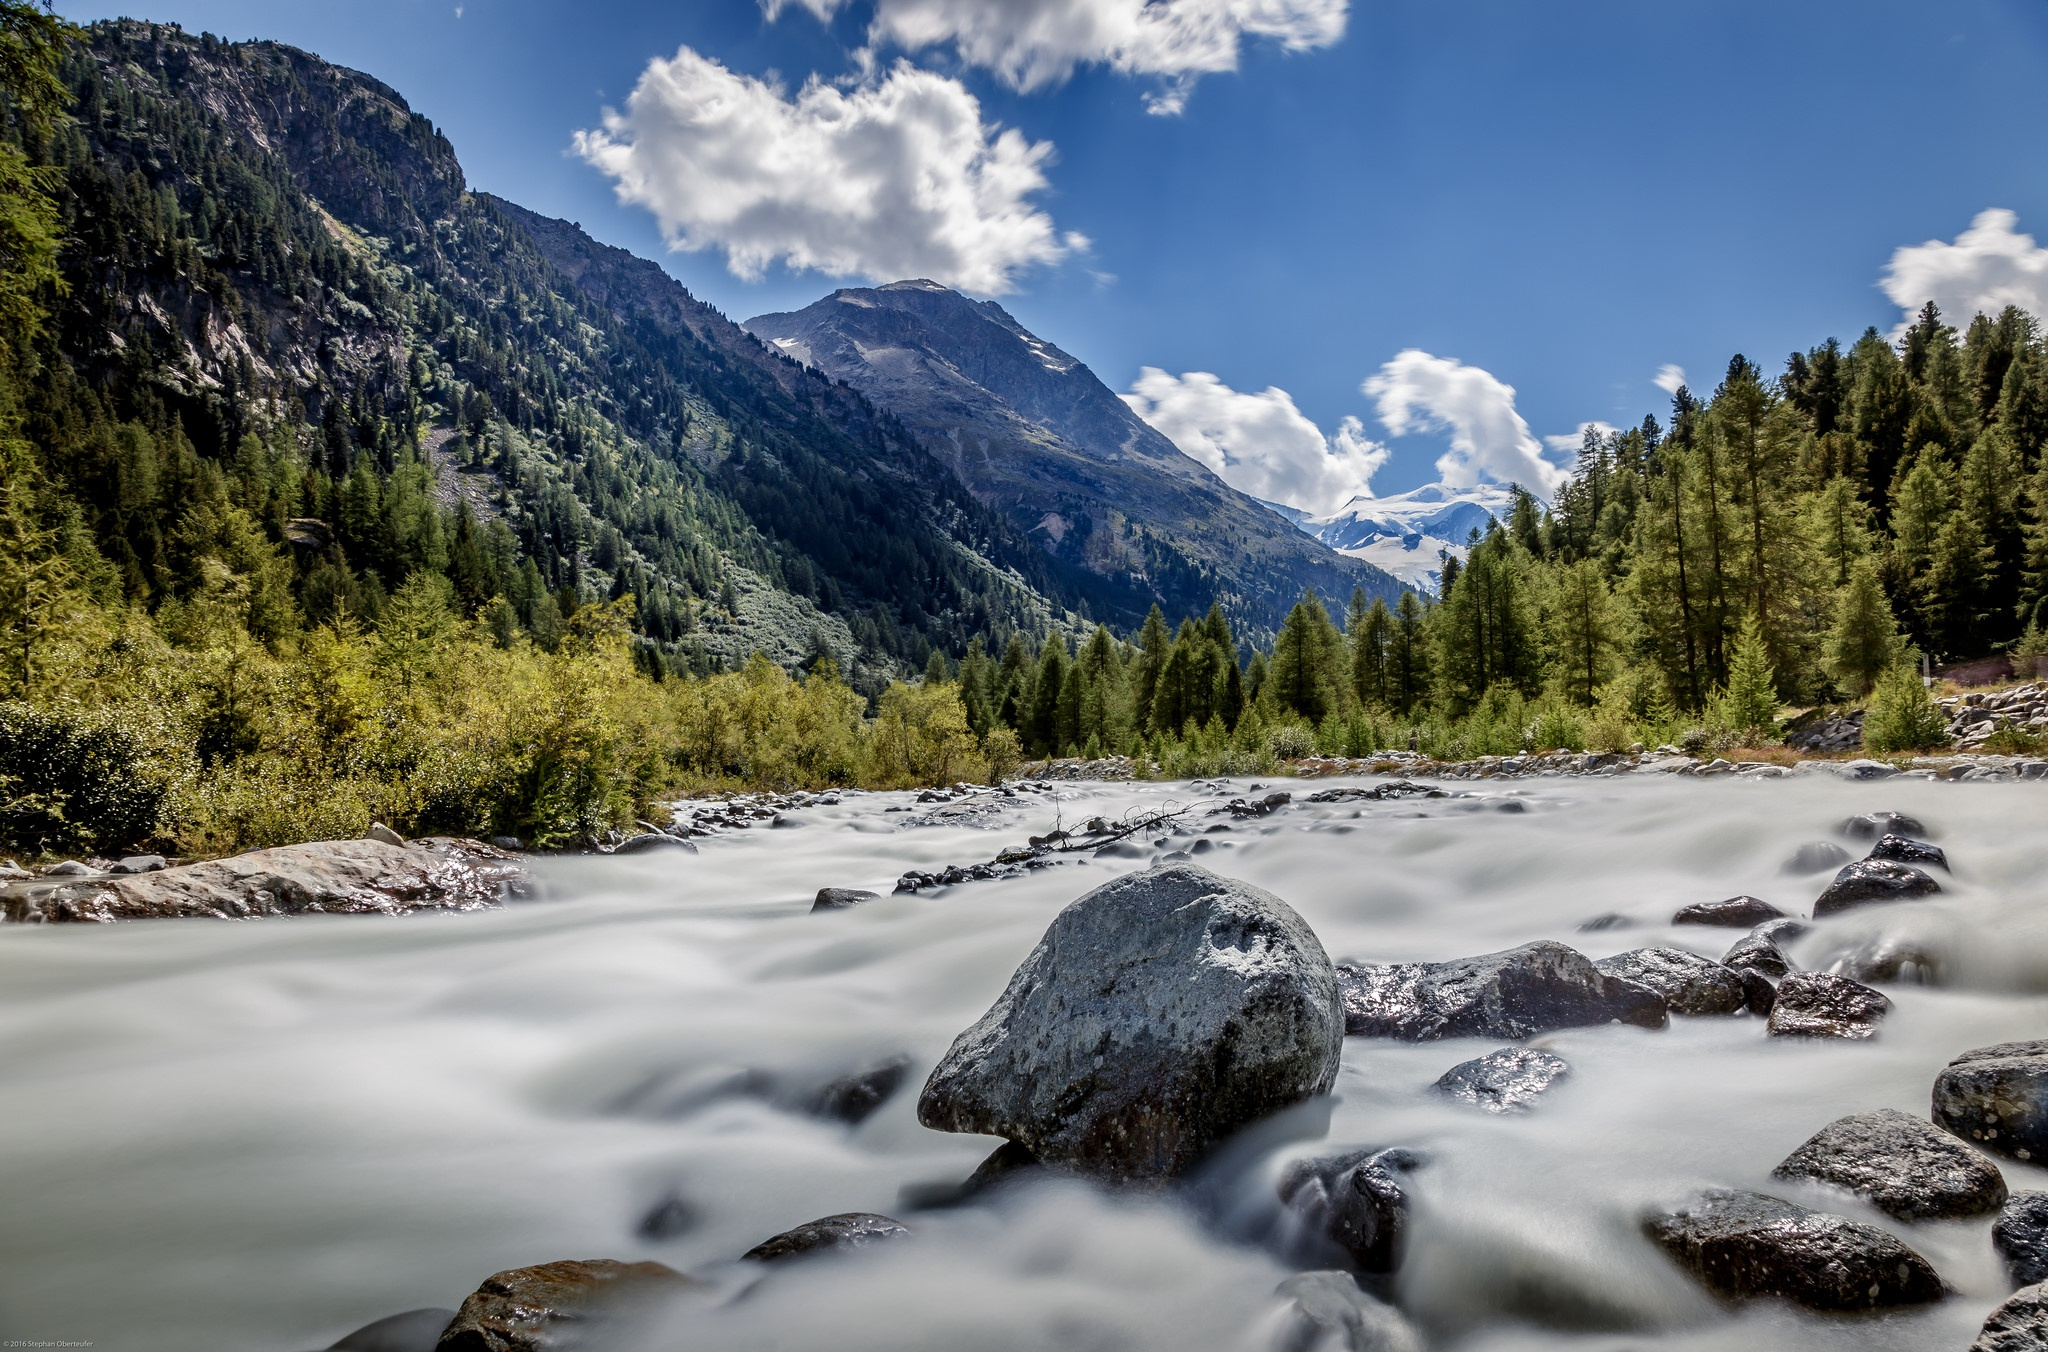 Piz Bernina, Moteratsch Glacier, Engadine, Switzerland  № 1473573 загрузить